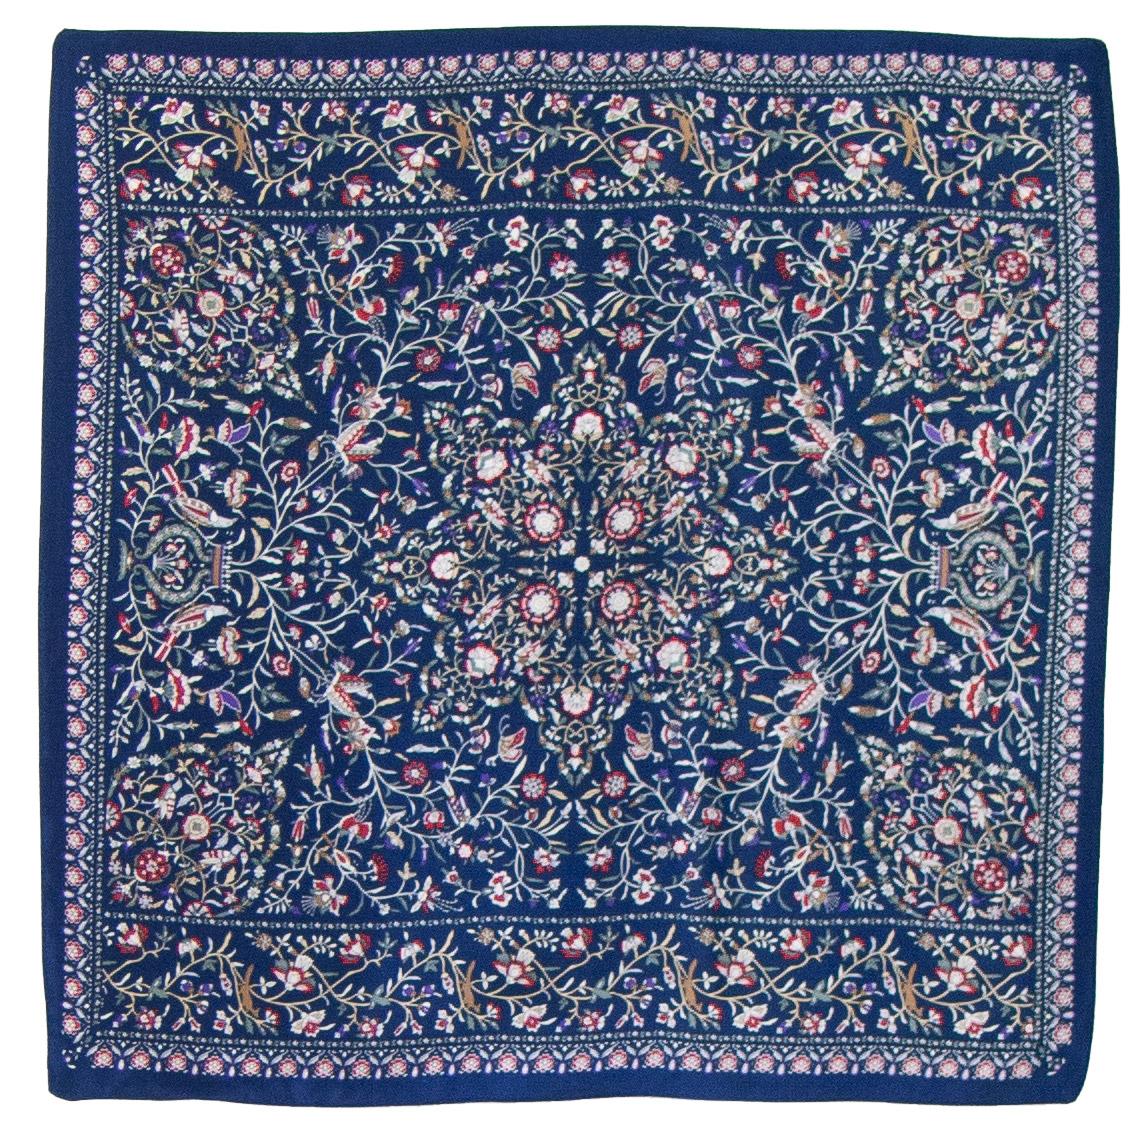 Foulard en soie carré bleu Kassie 50 cm